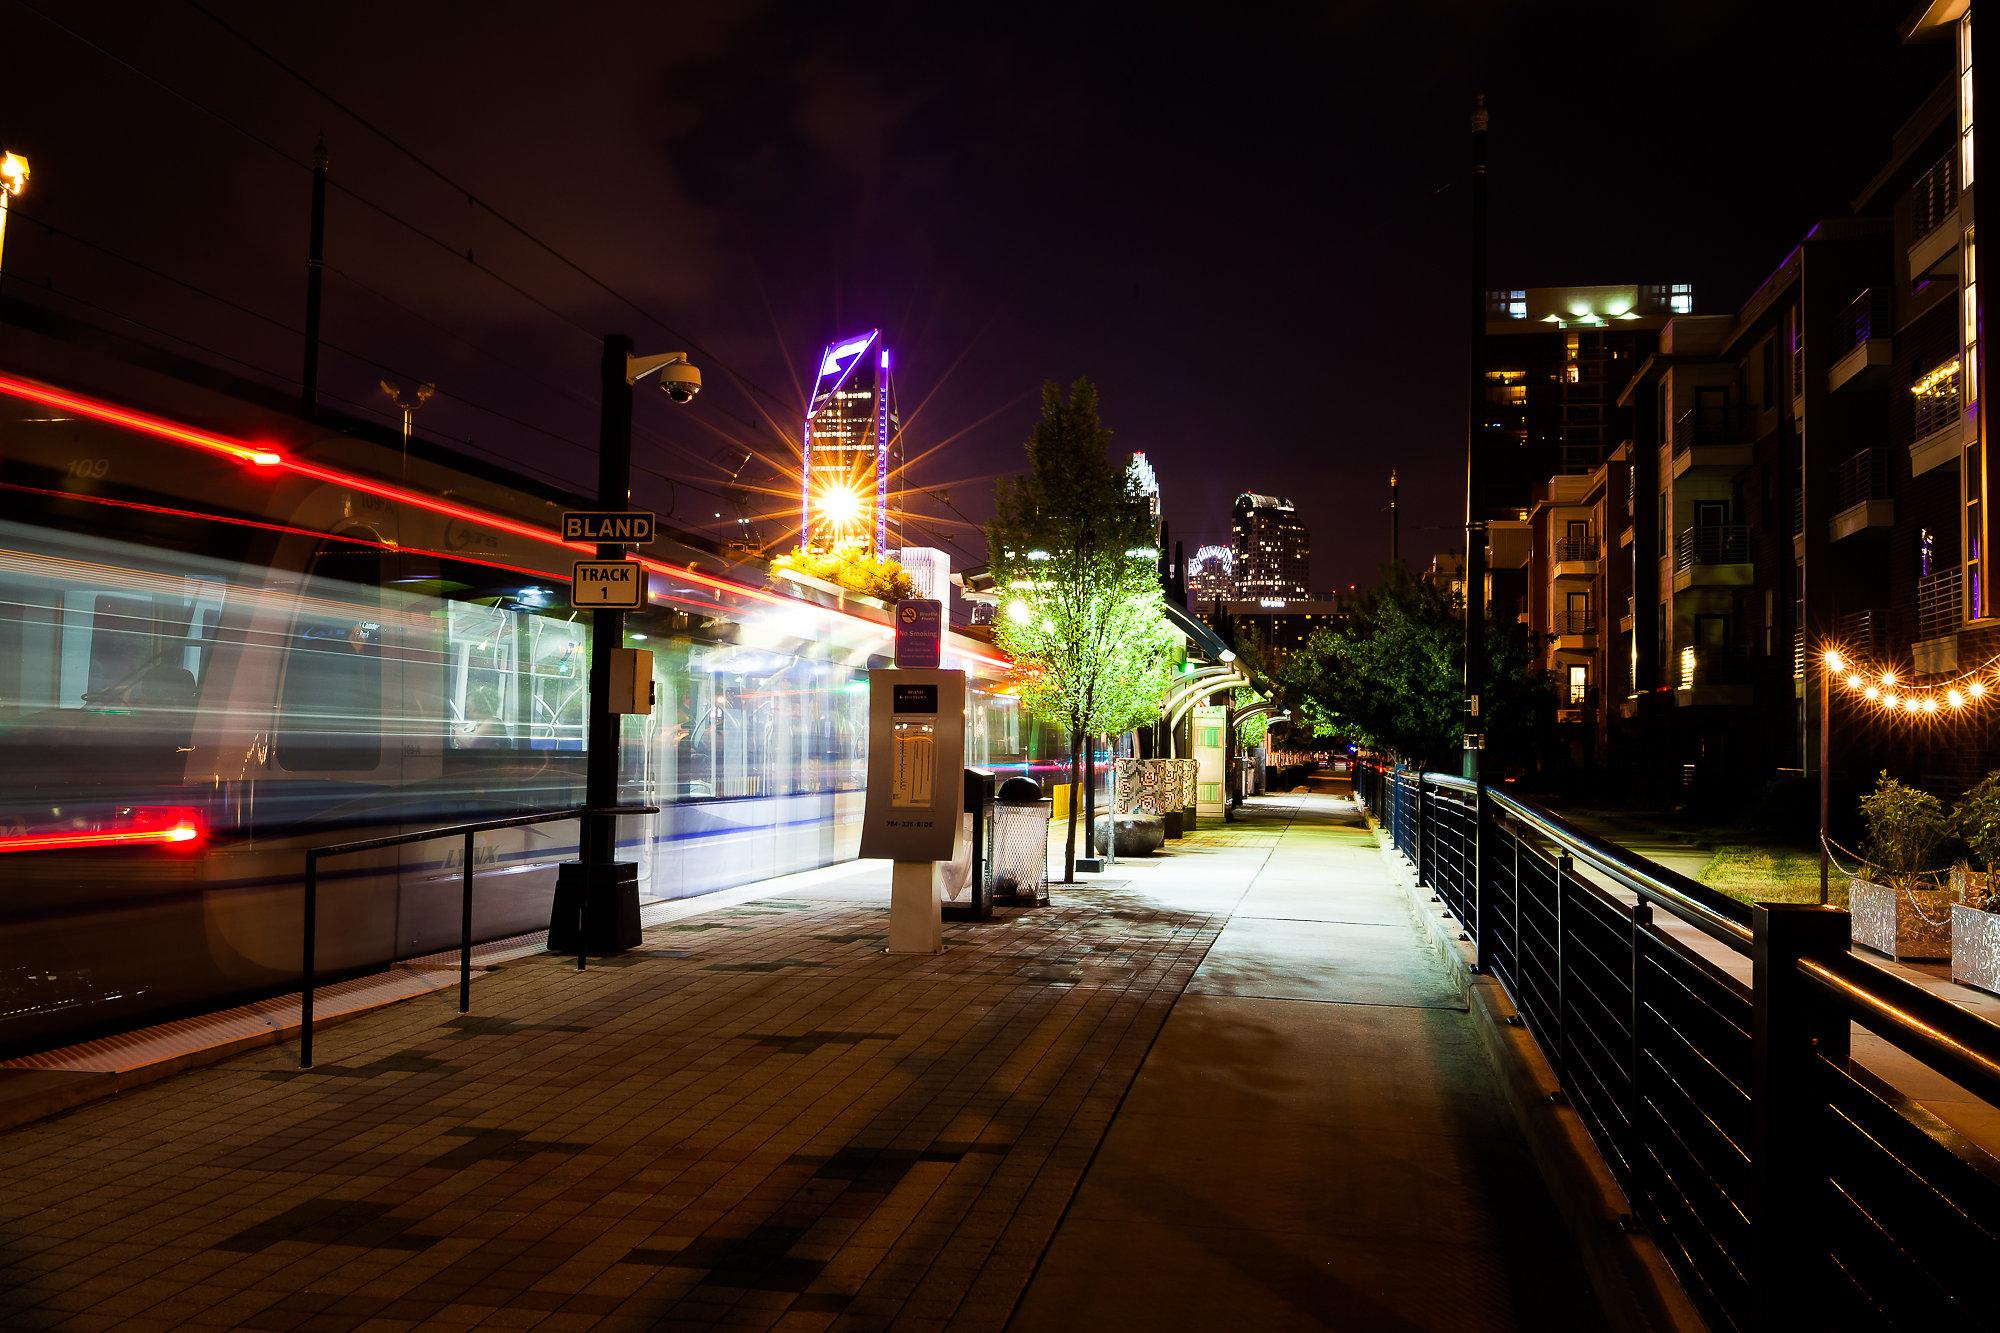 Light Rail Bland Station